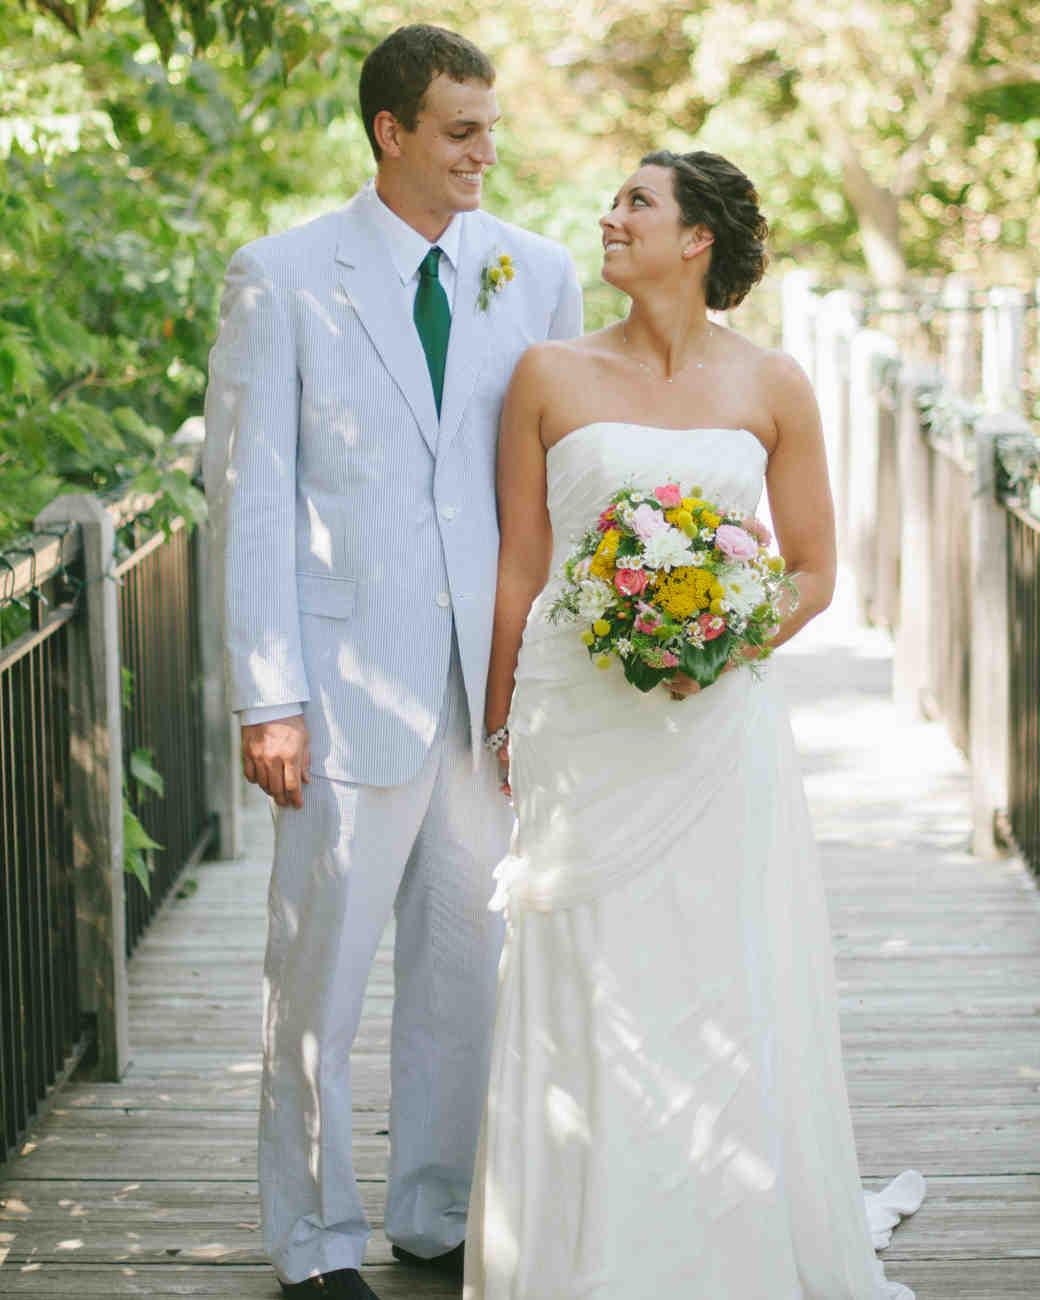 A Crafty Rustic Outdoor Wedding in Bellevue Nebraska Martha